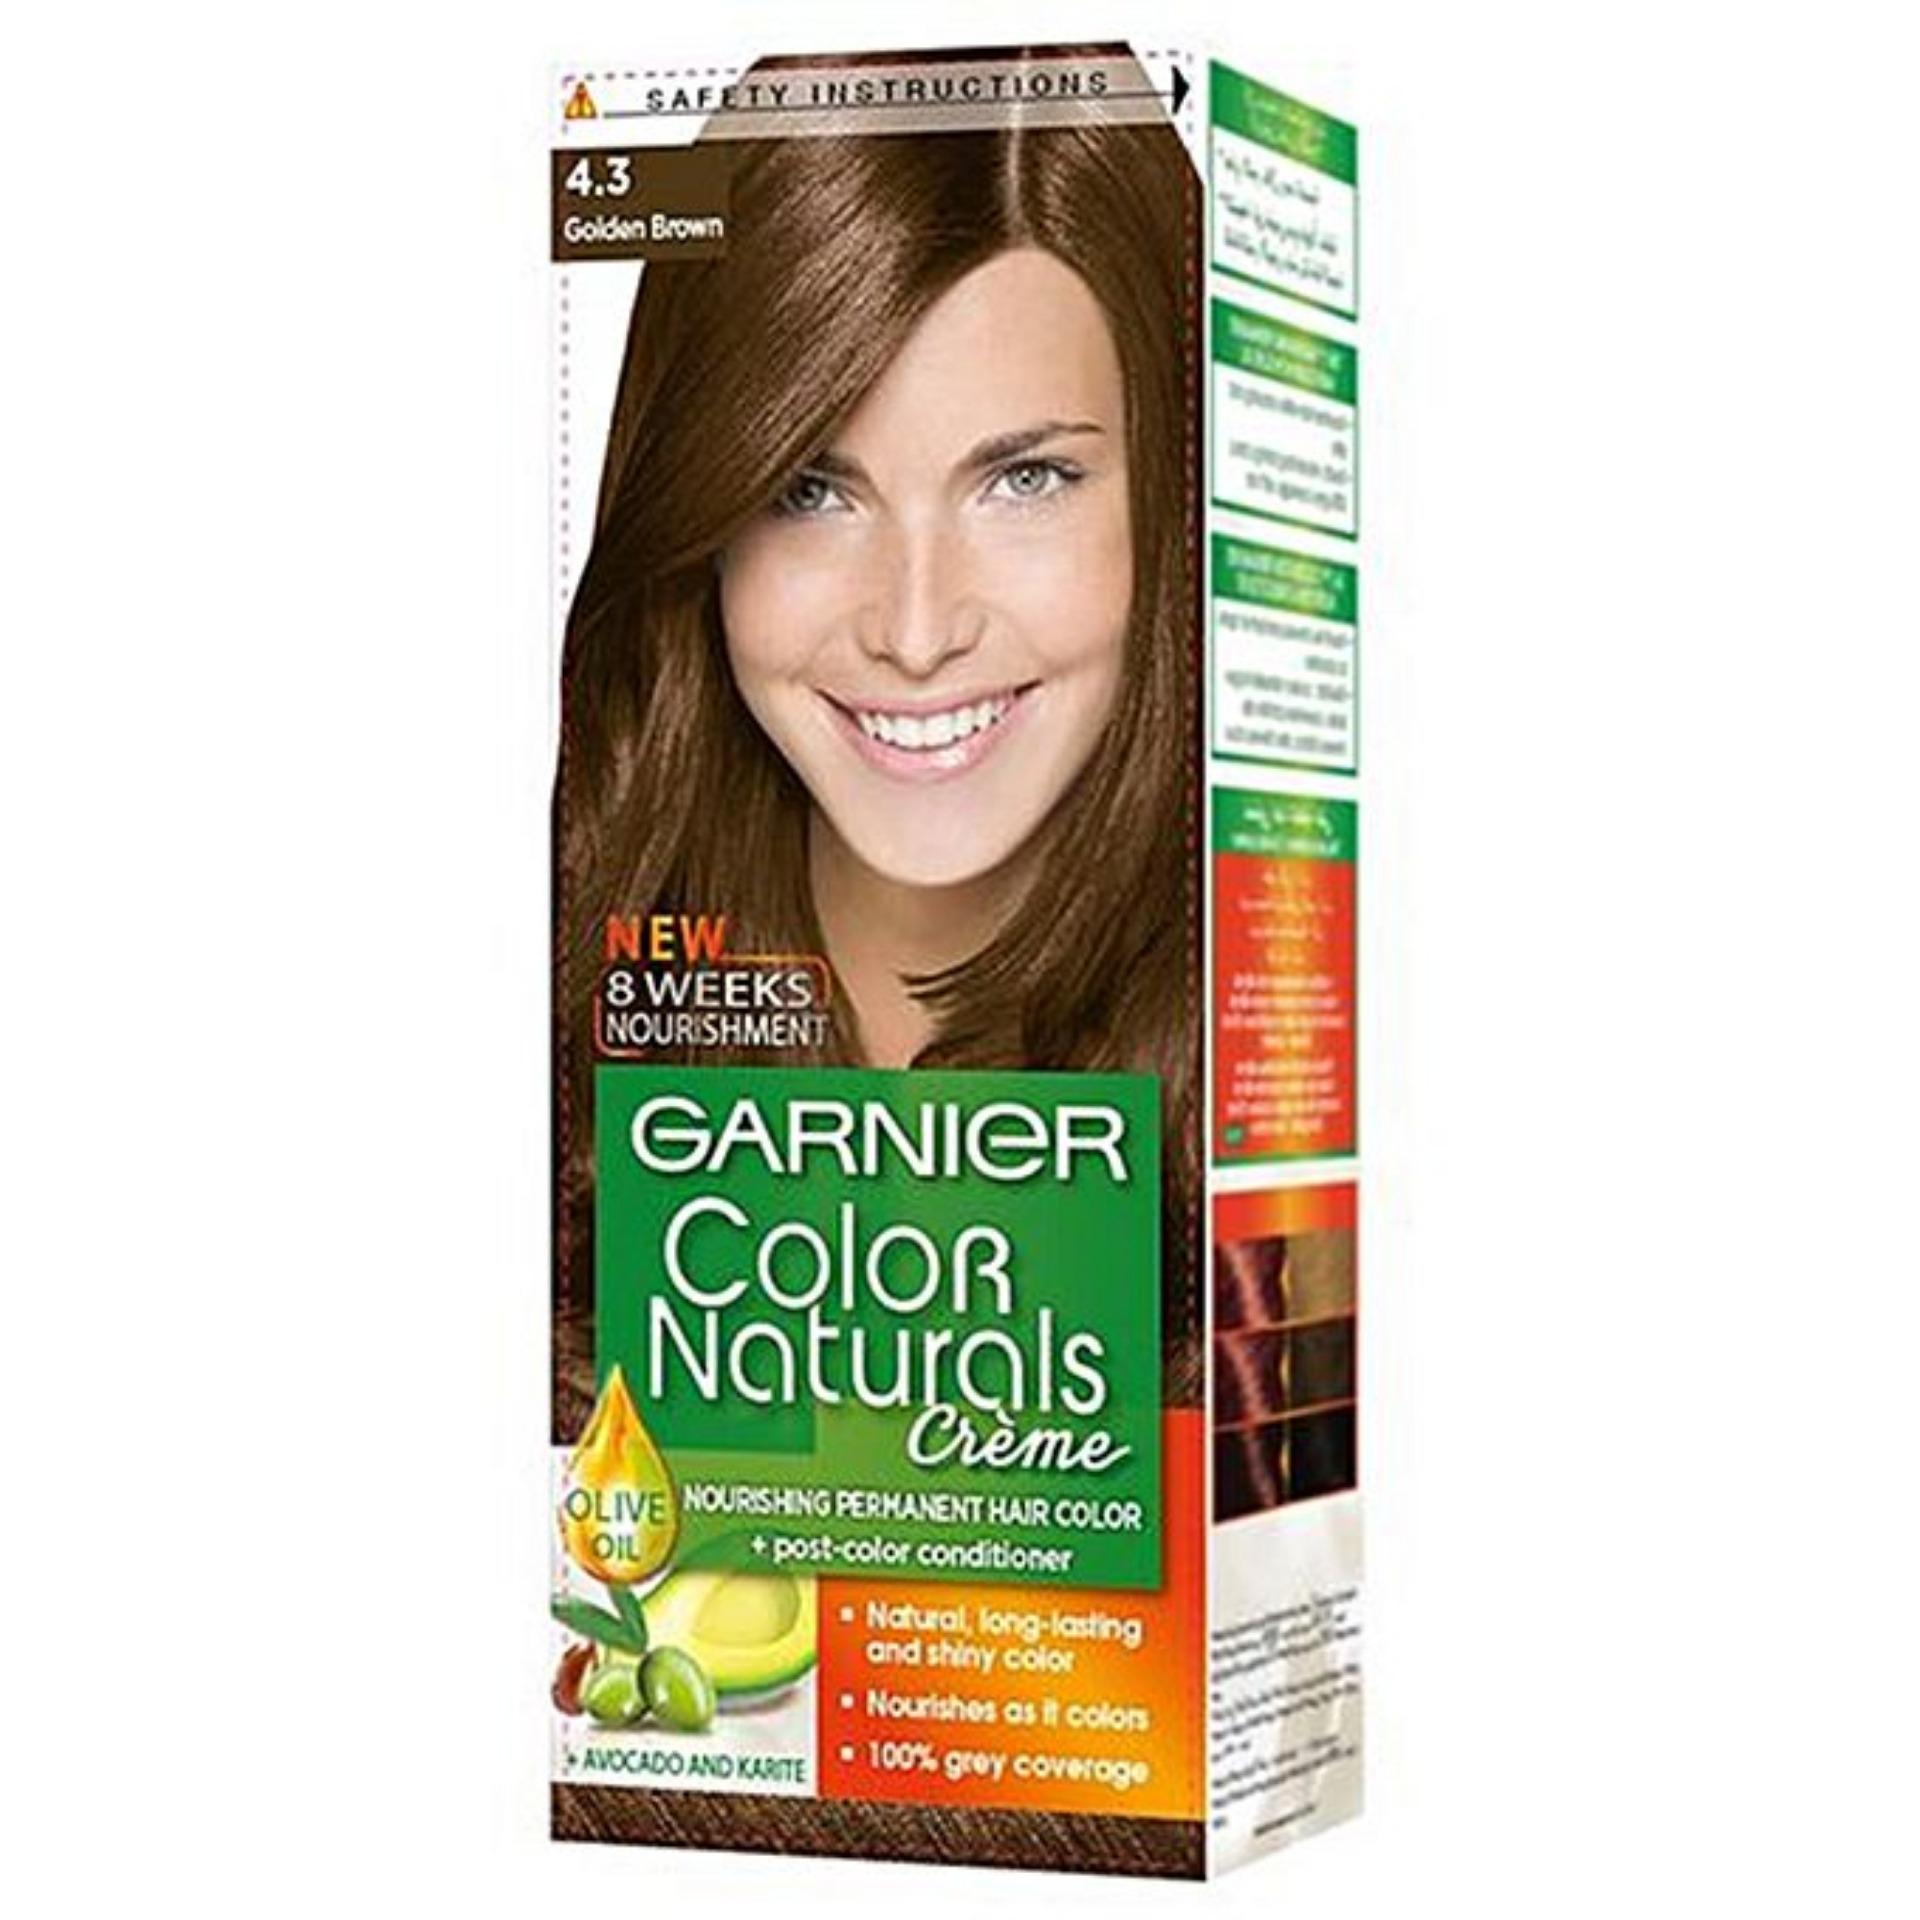 Garnier Color Naturals 4.3 Golden Brown Hair Color